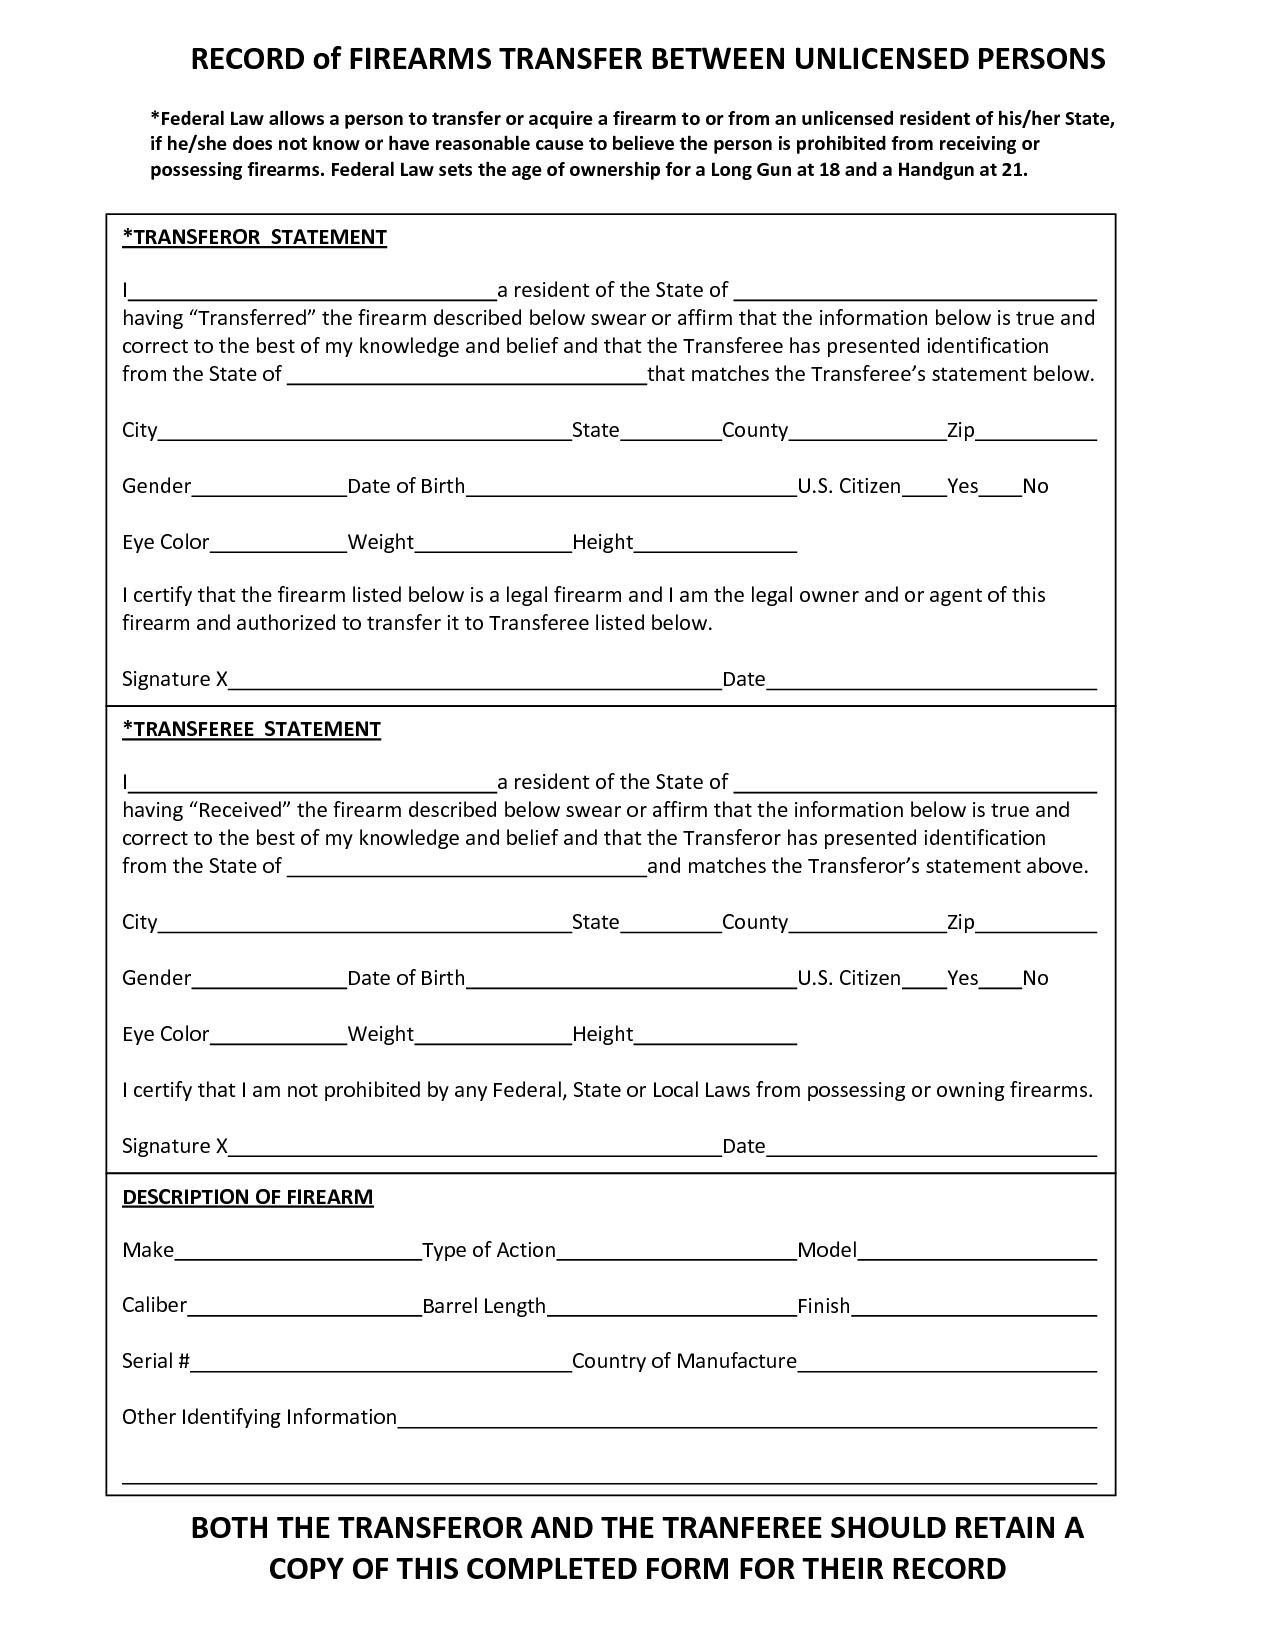 Nfa Trust Form 4